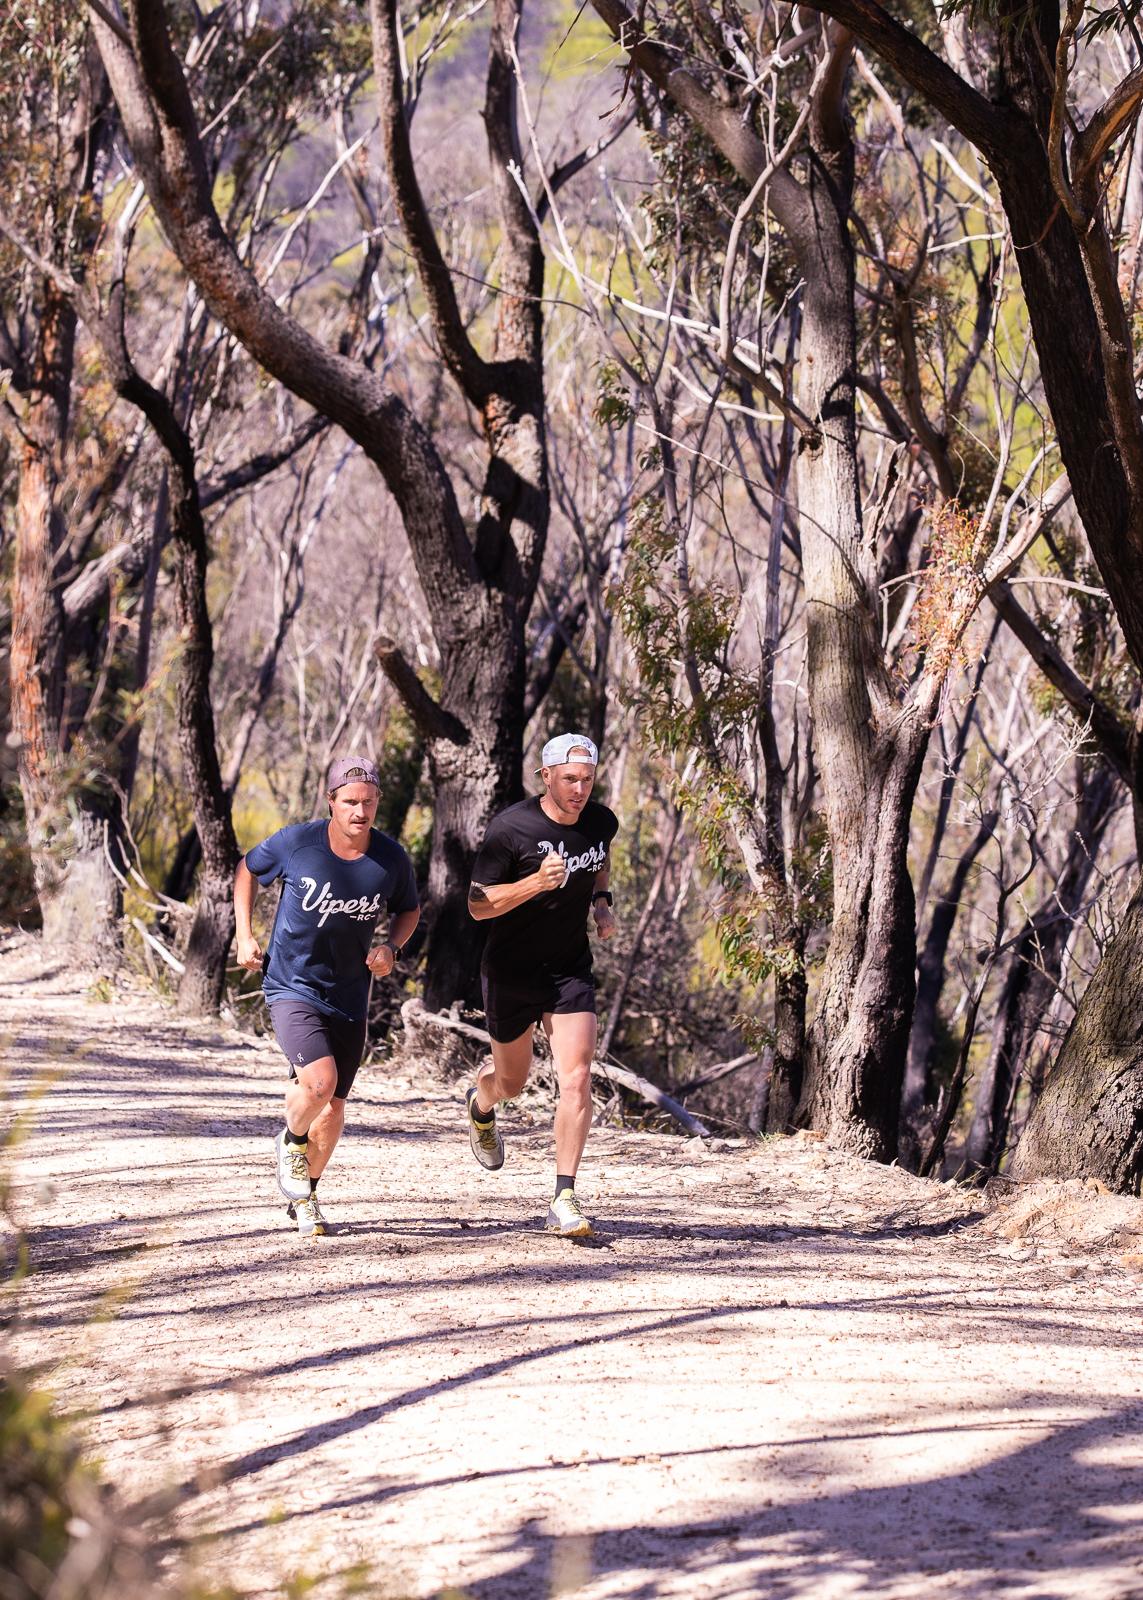 Matt Abel and Olly Woolrych Vipers Run Club